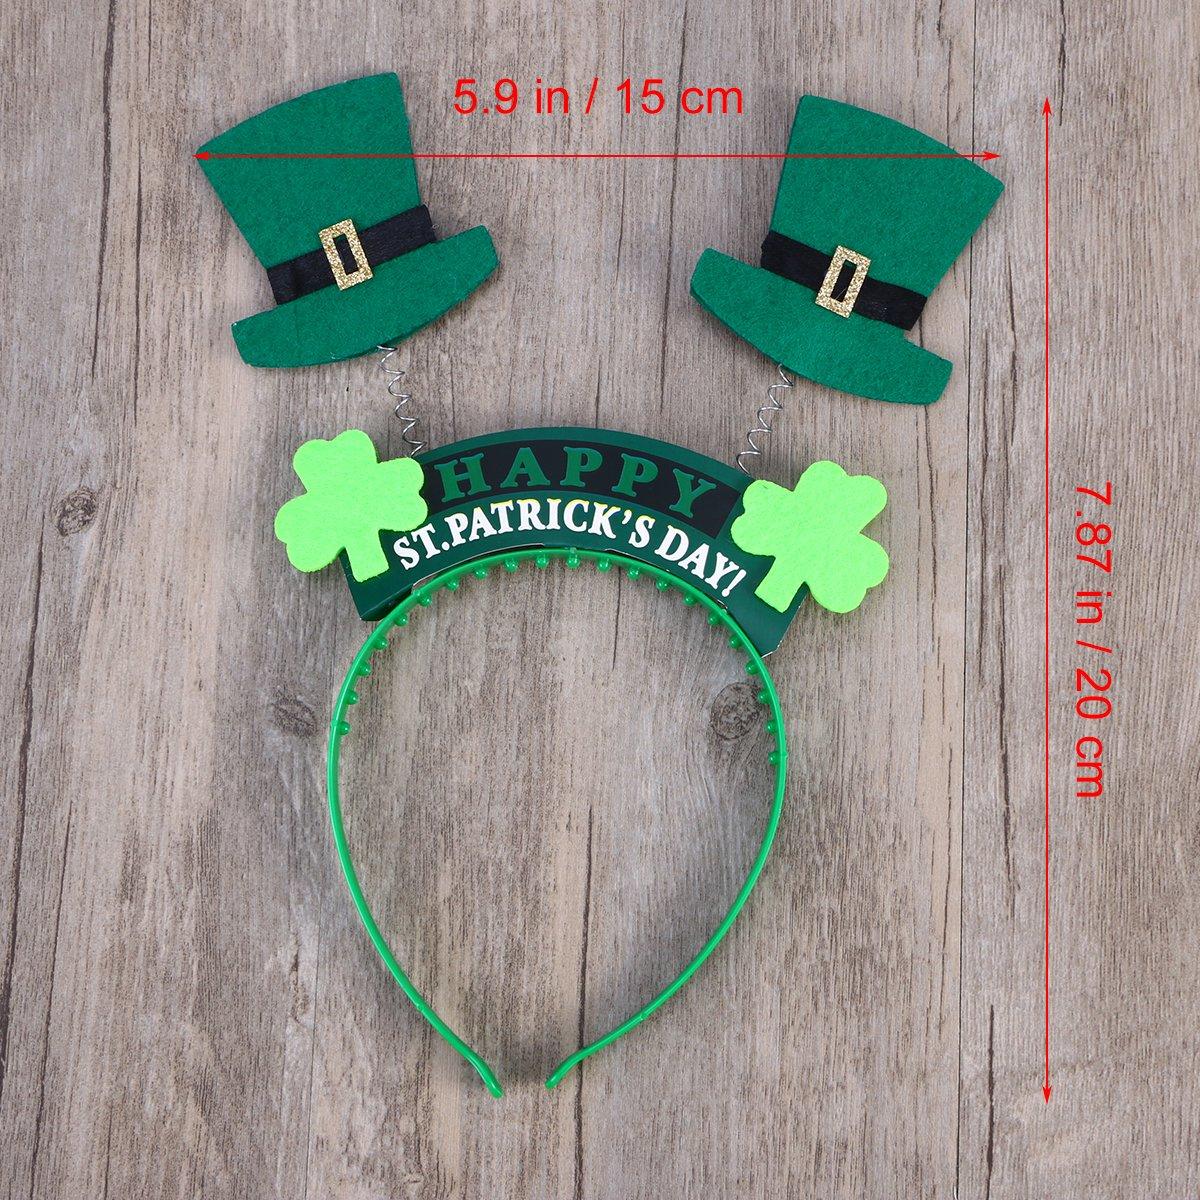 ST PATRICKS DAY JESTER HAT GREEN//WHITE BELLS+GREEN//WHITE STRIPE SOCKS FANCYDRESS